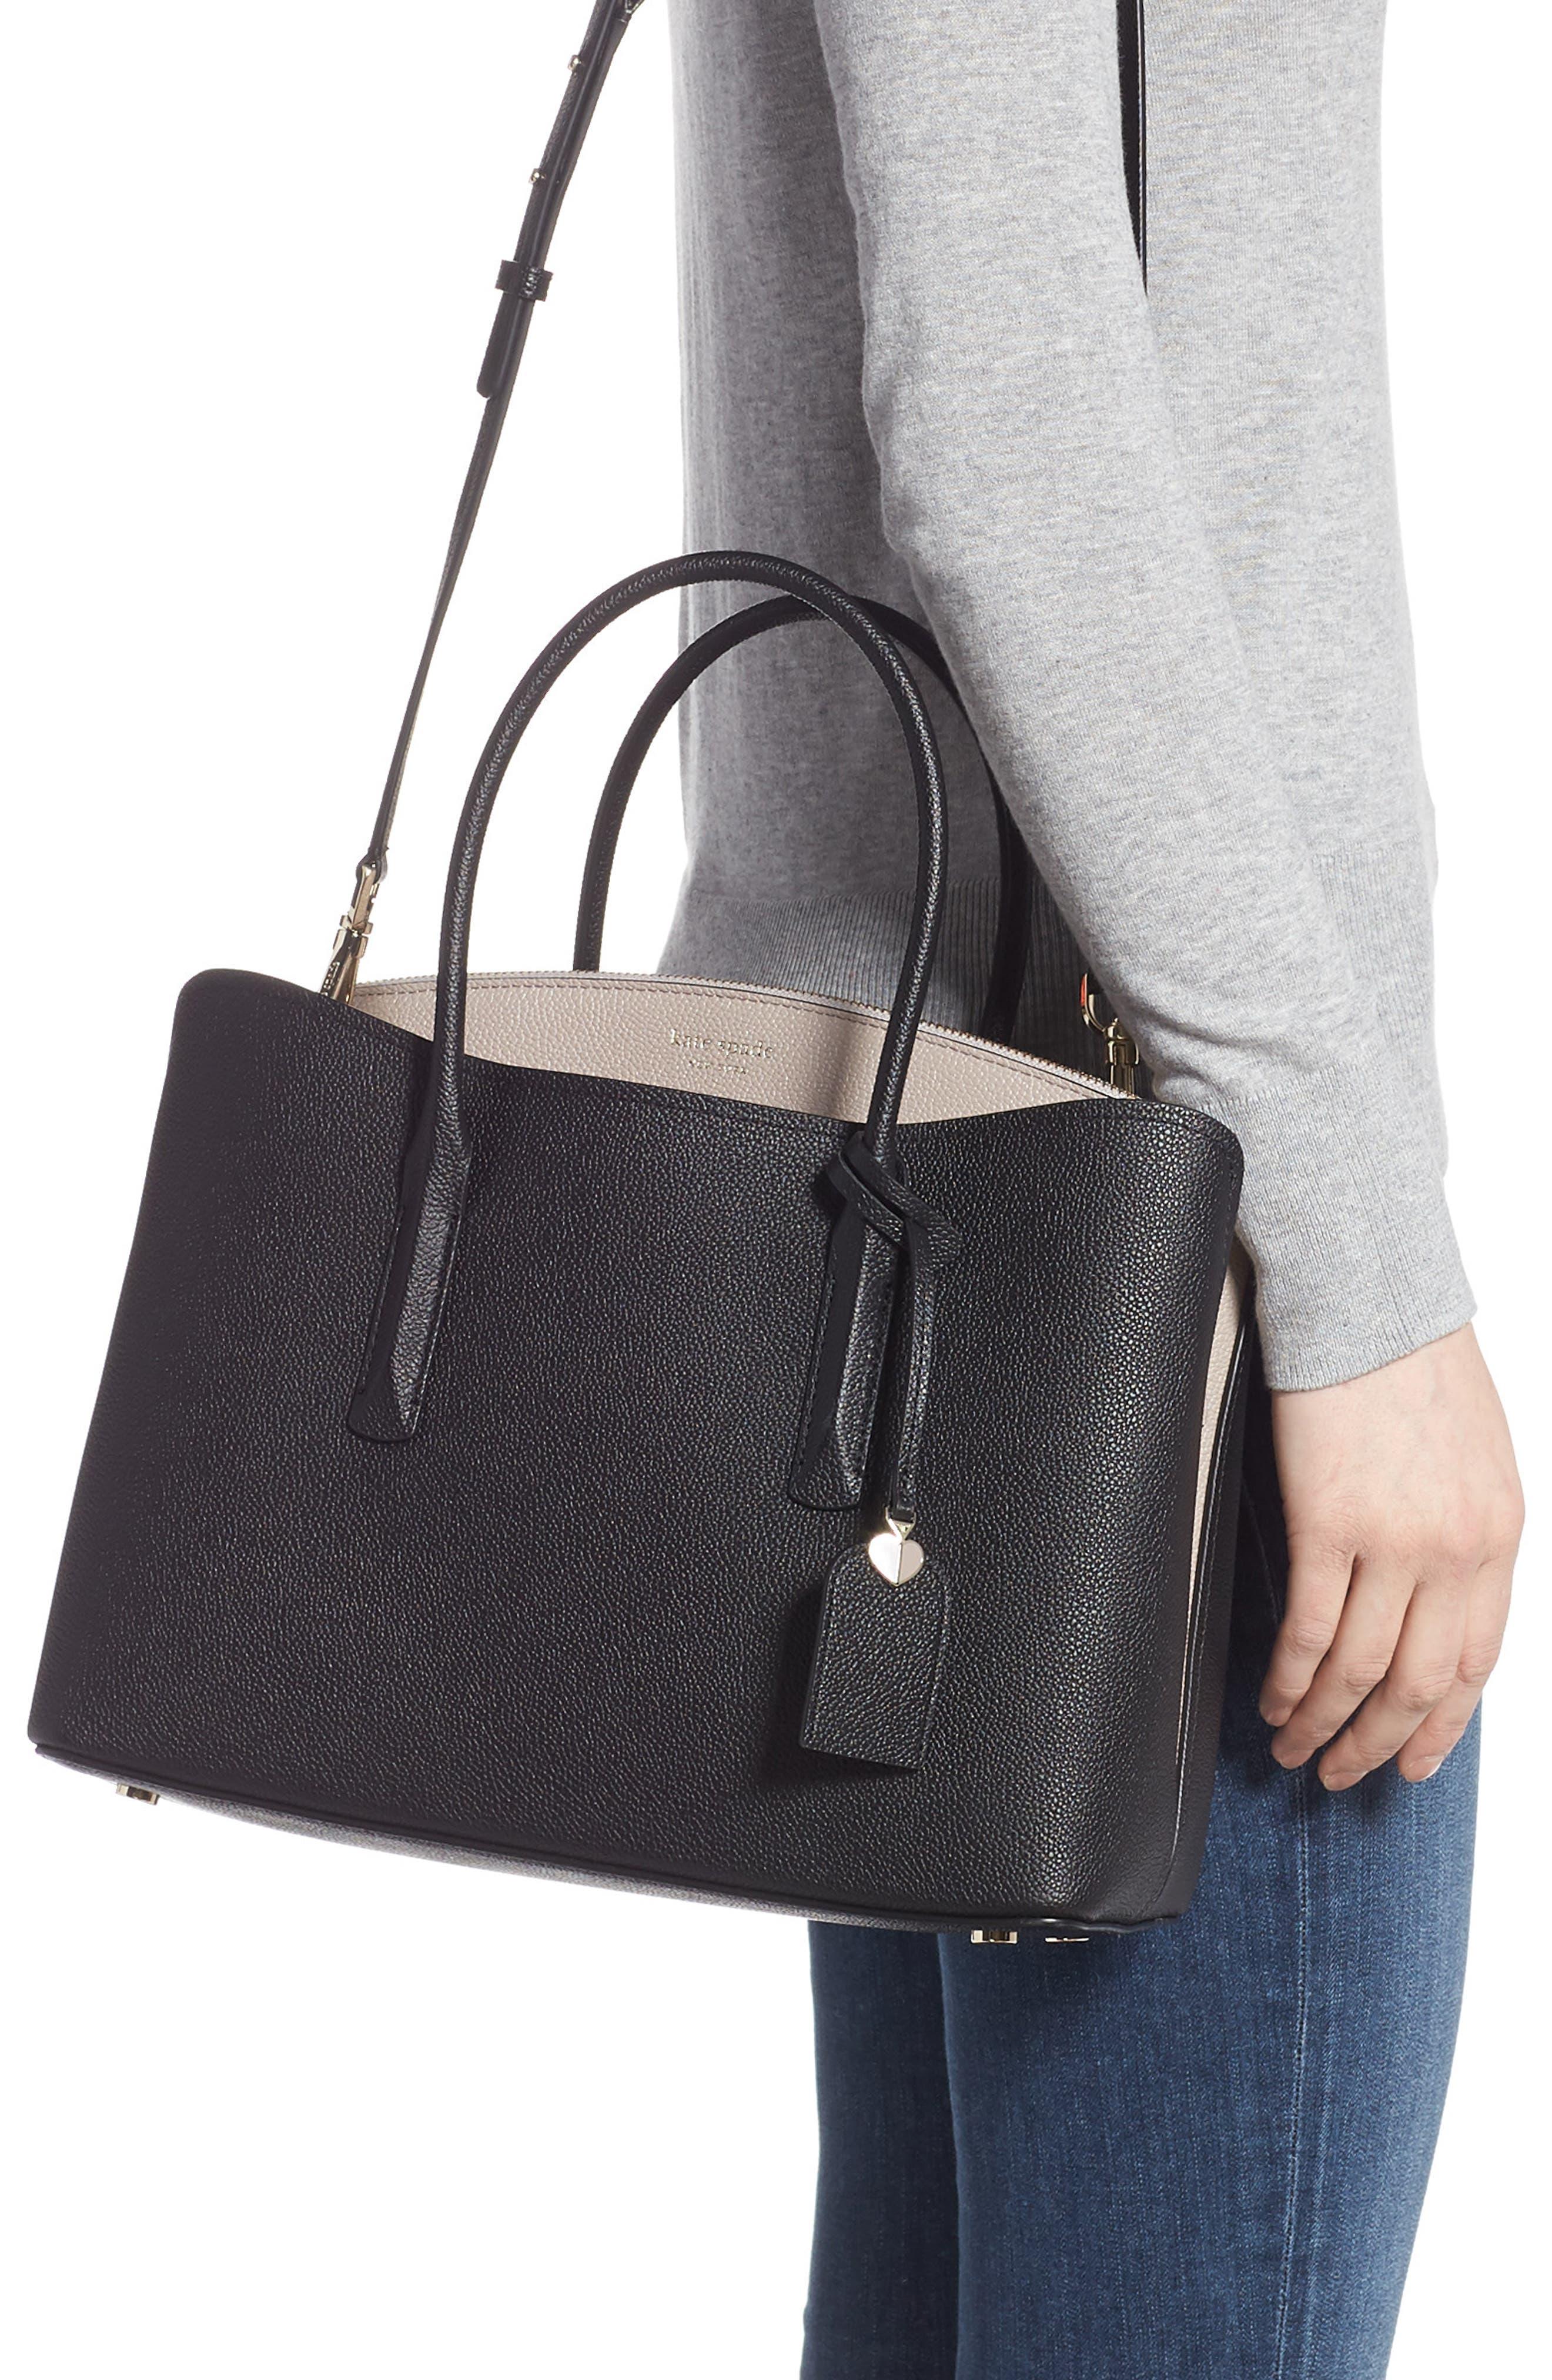 KATE SPADE NEW YORK, large margaux leather satchel, Alternate thumbnail 2, color, BLACK/ WARM TAUPE